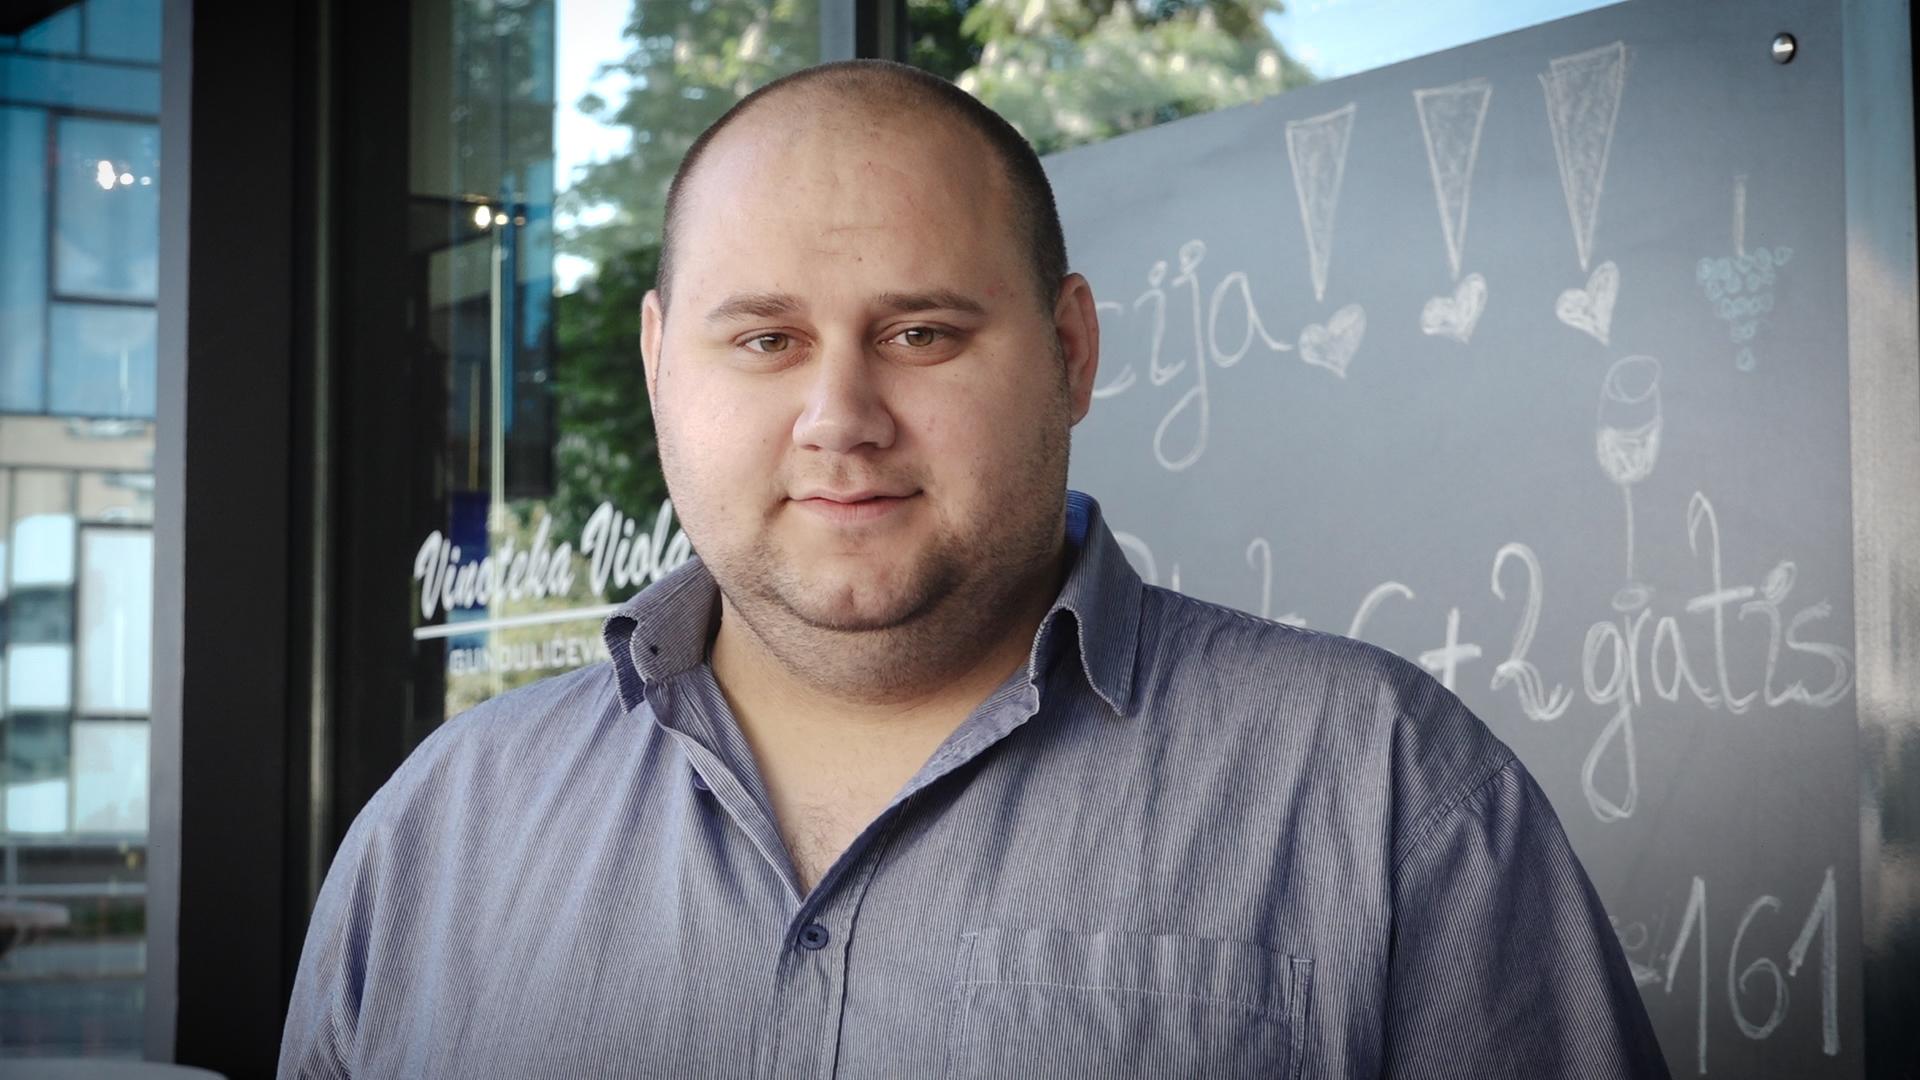 Branko Medak pjesmom zabavlja i uveseljava ljude